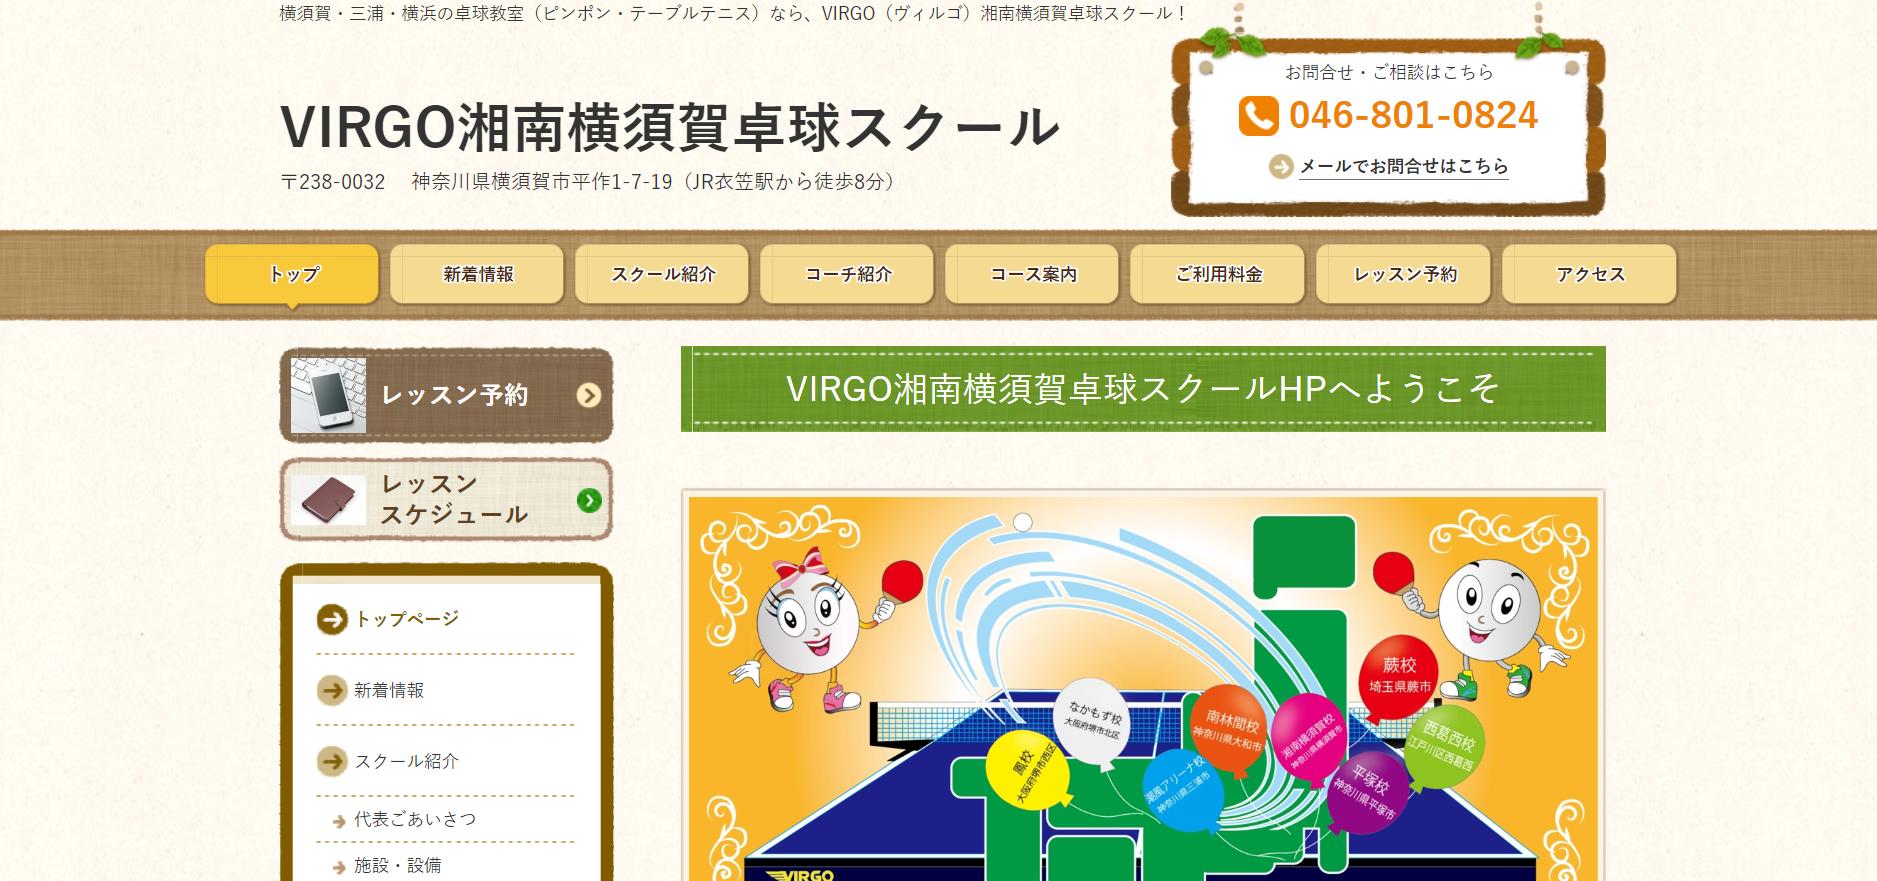 VIRGO湘南横須賀卓球スクール